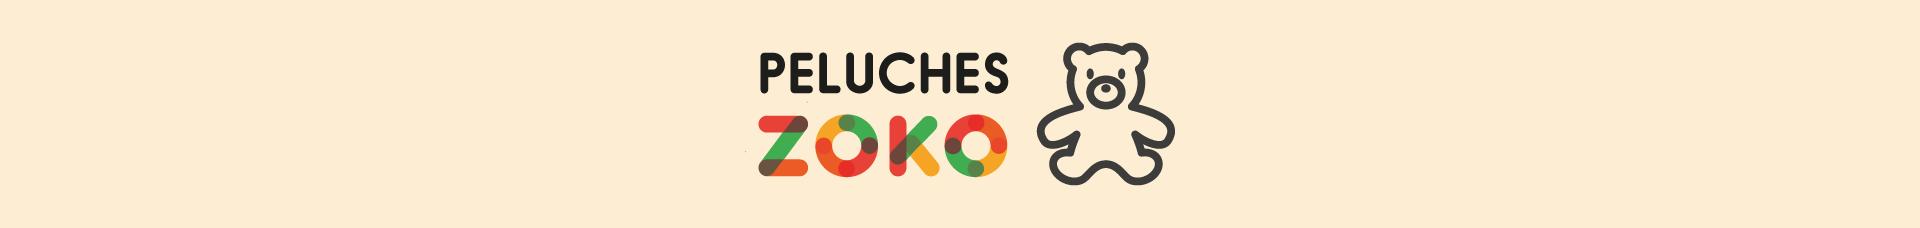 Peluches Zoko